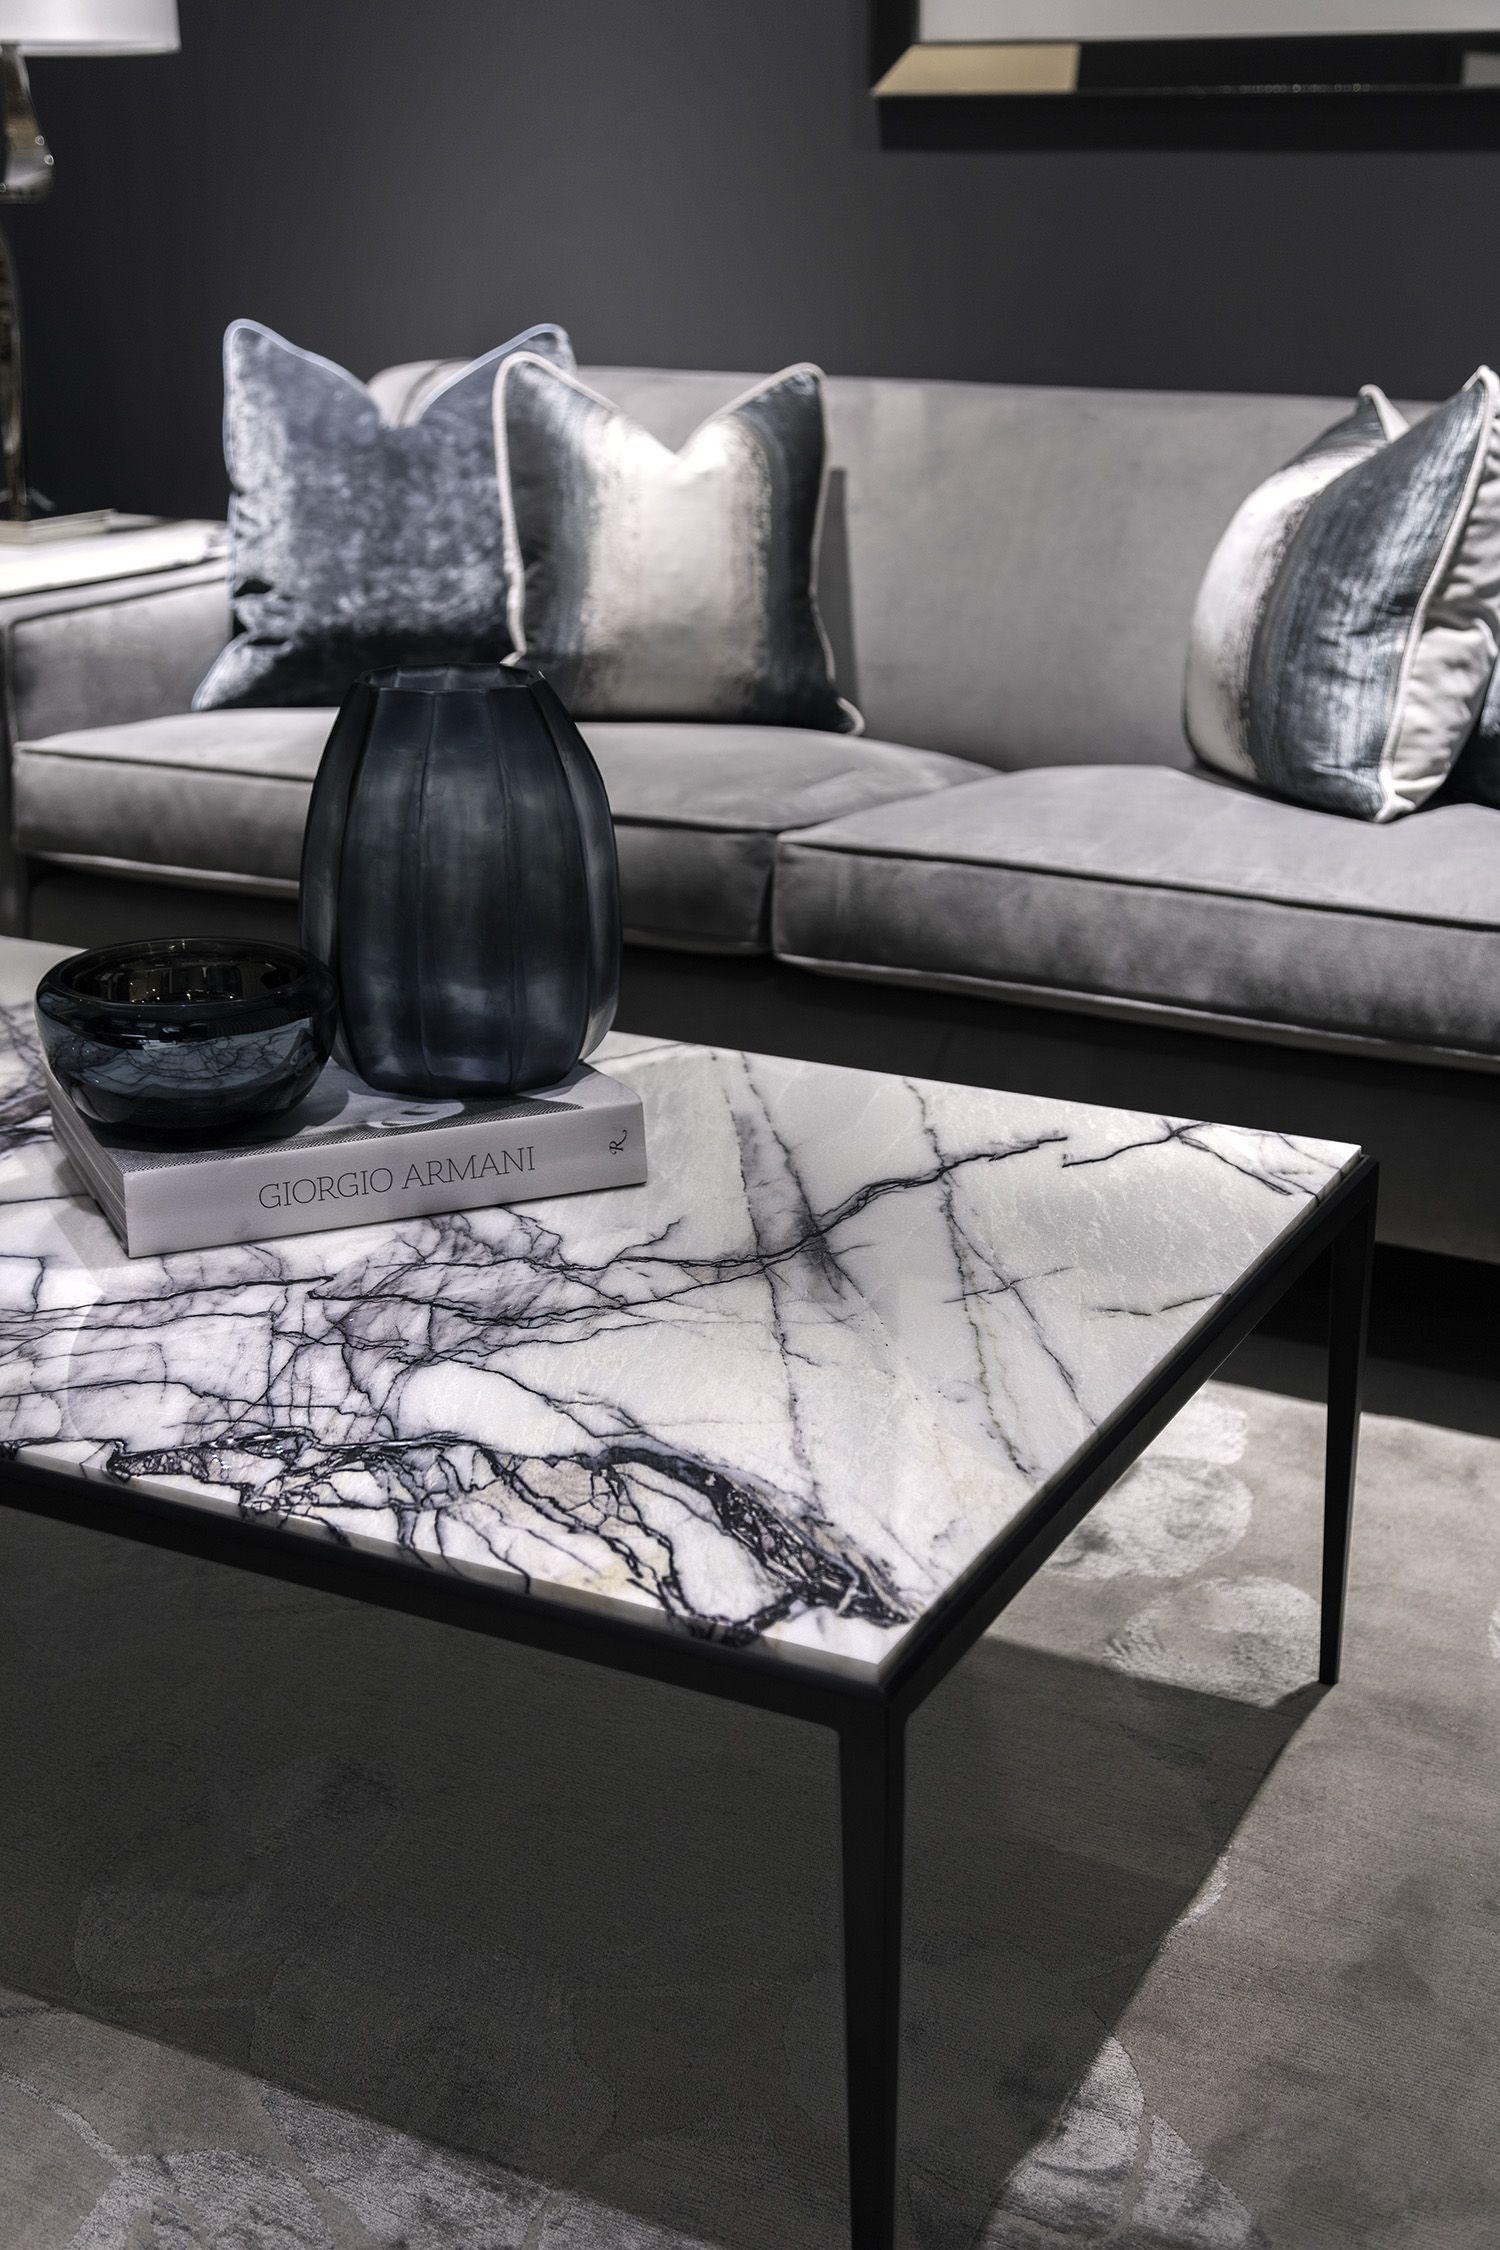 Sleek Design Slender Lines Luxurious Our Henley Marble Coffee Side Tables Ensure They Look Luxurious But Do Not Lakberendezes Otletek Furdoszoba Otletek